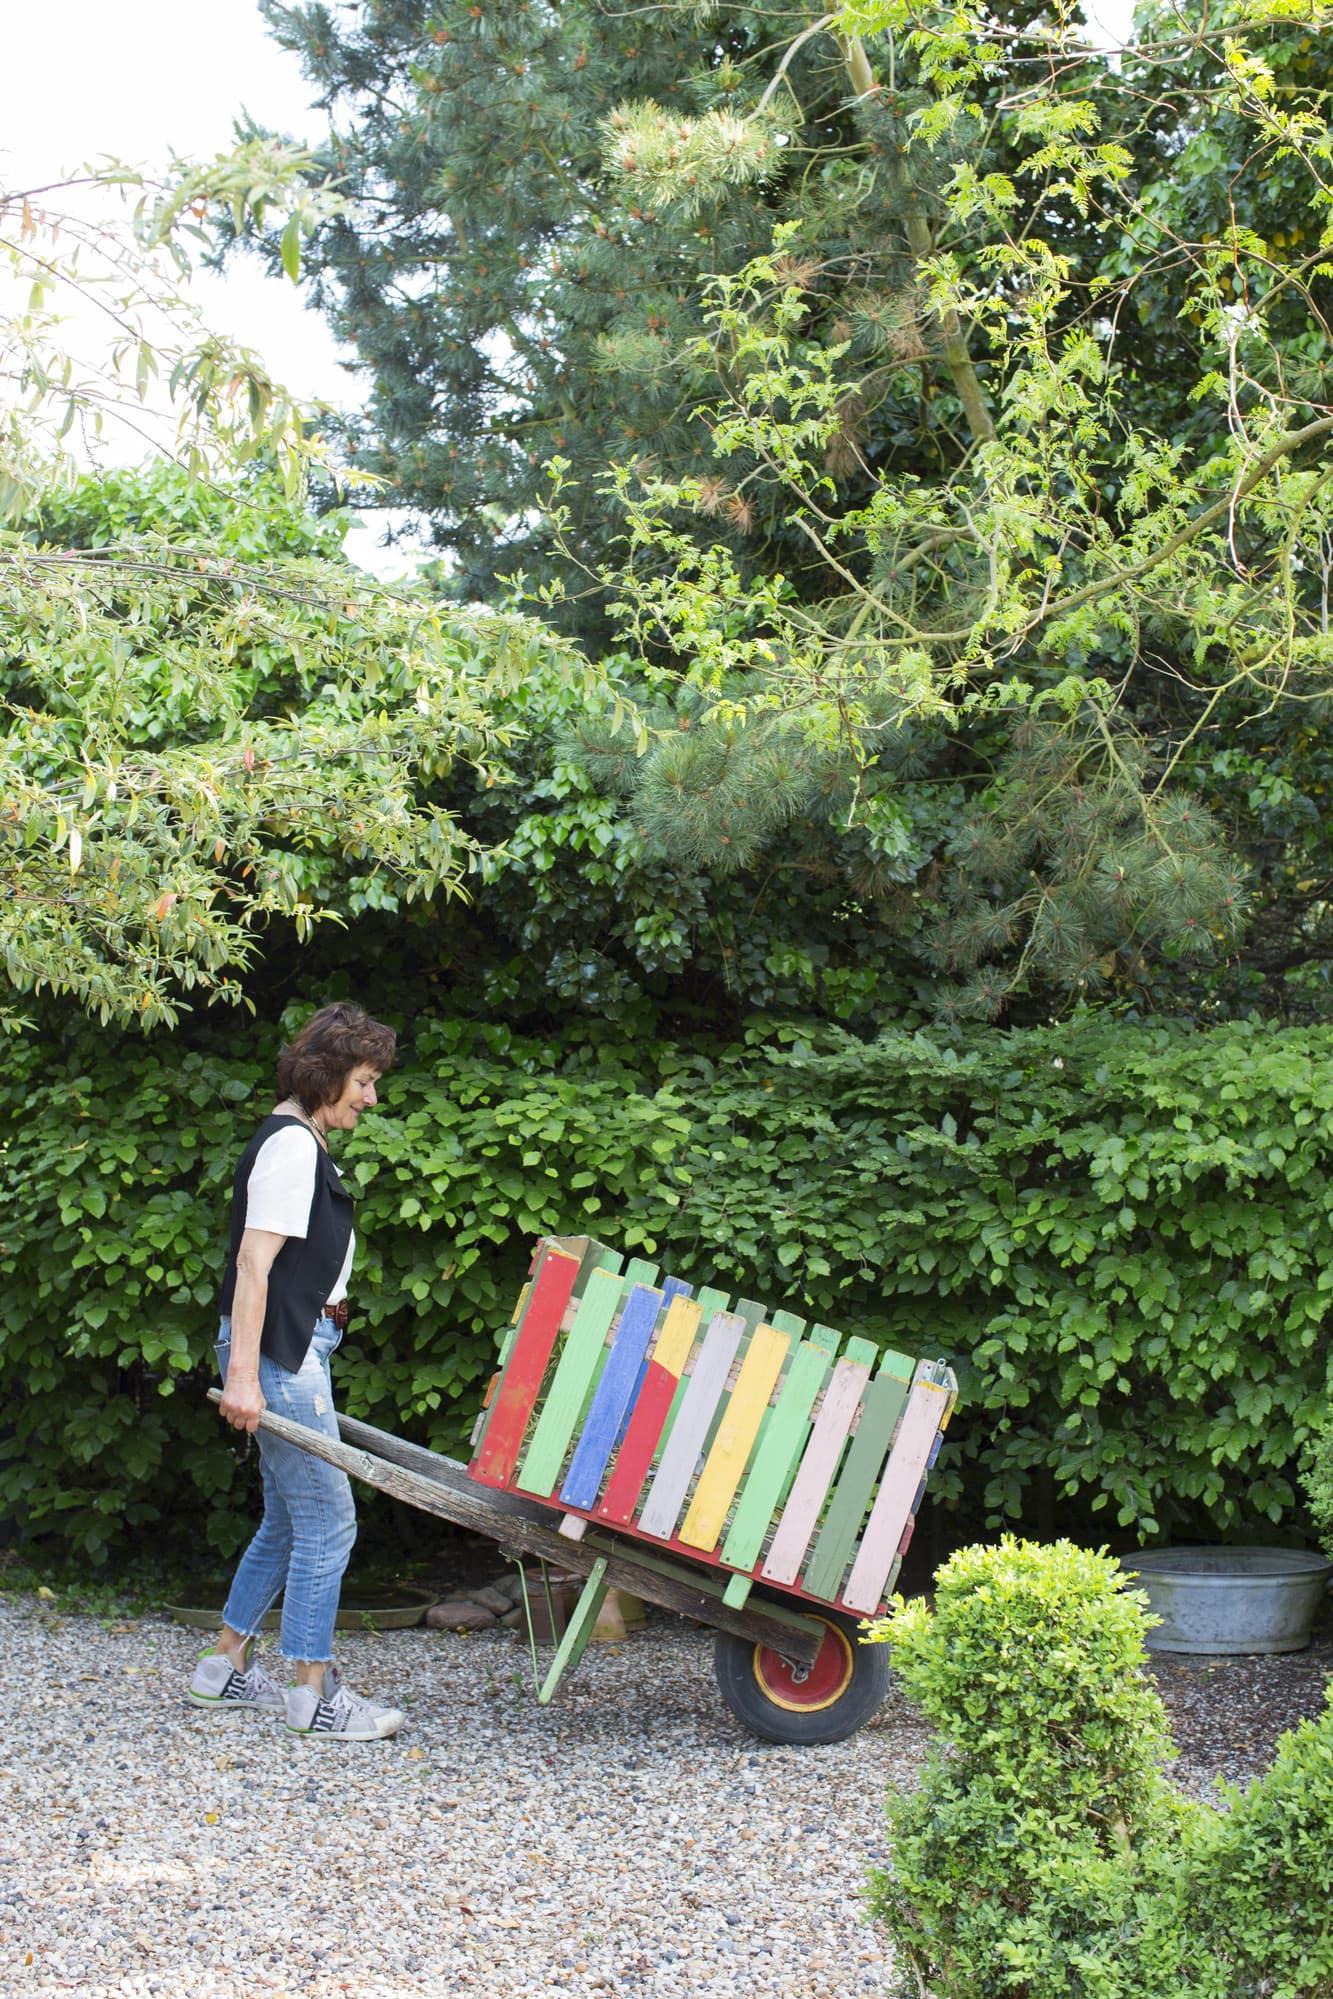 Self-built wheelbarrow in happy colors.